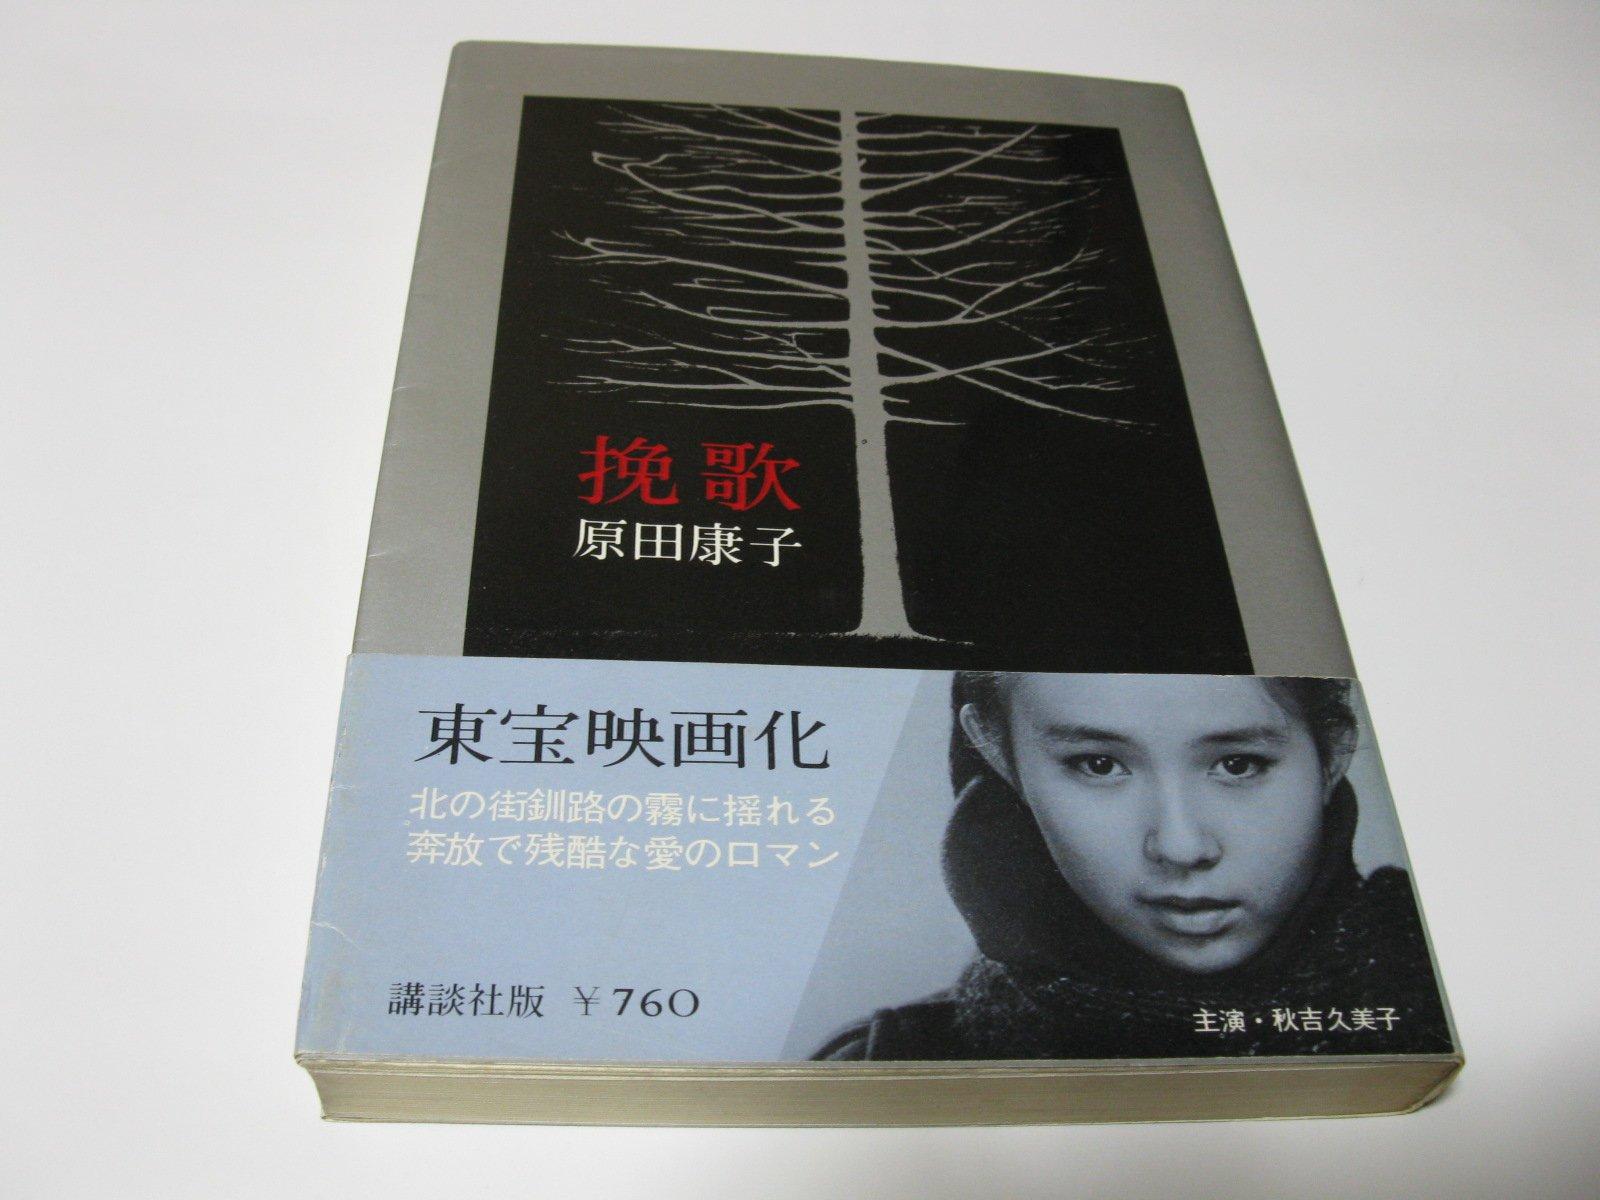 Amazon.co.jp: 挽歌 (新装版): 原田康子: 本